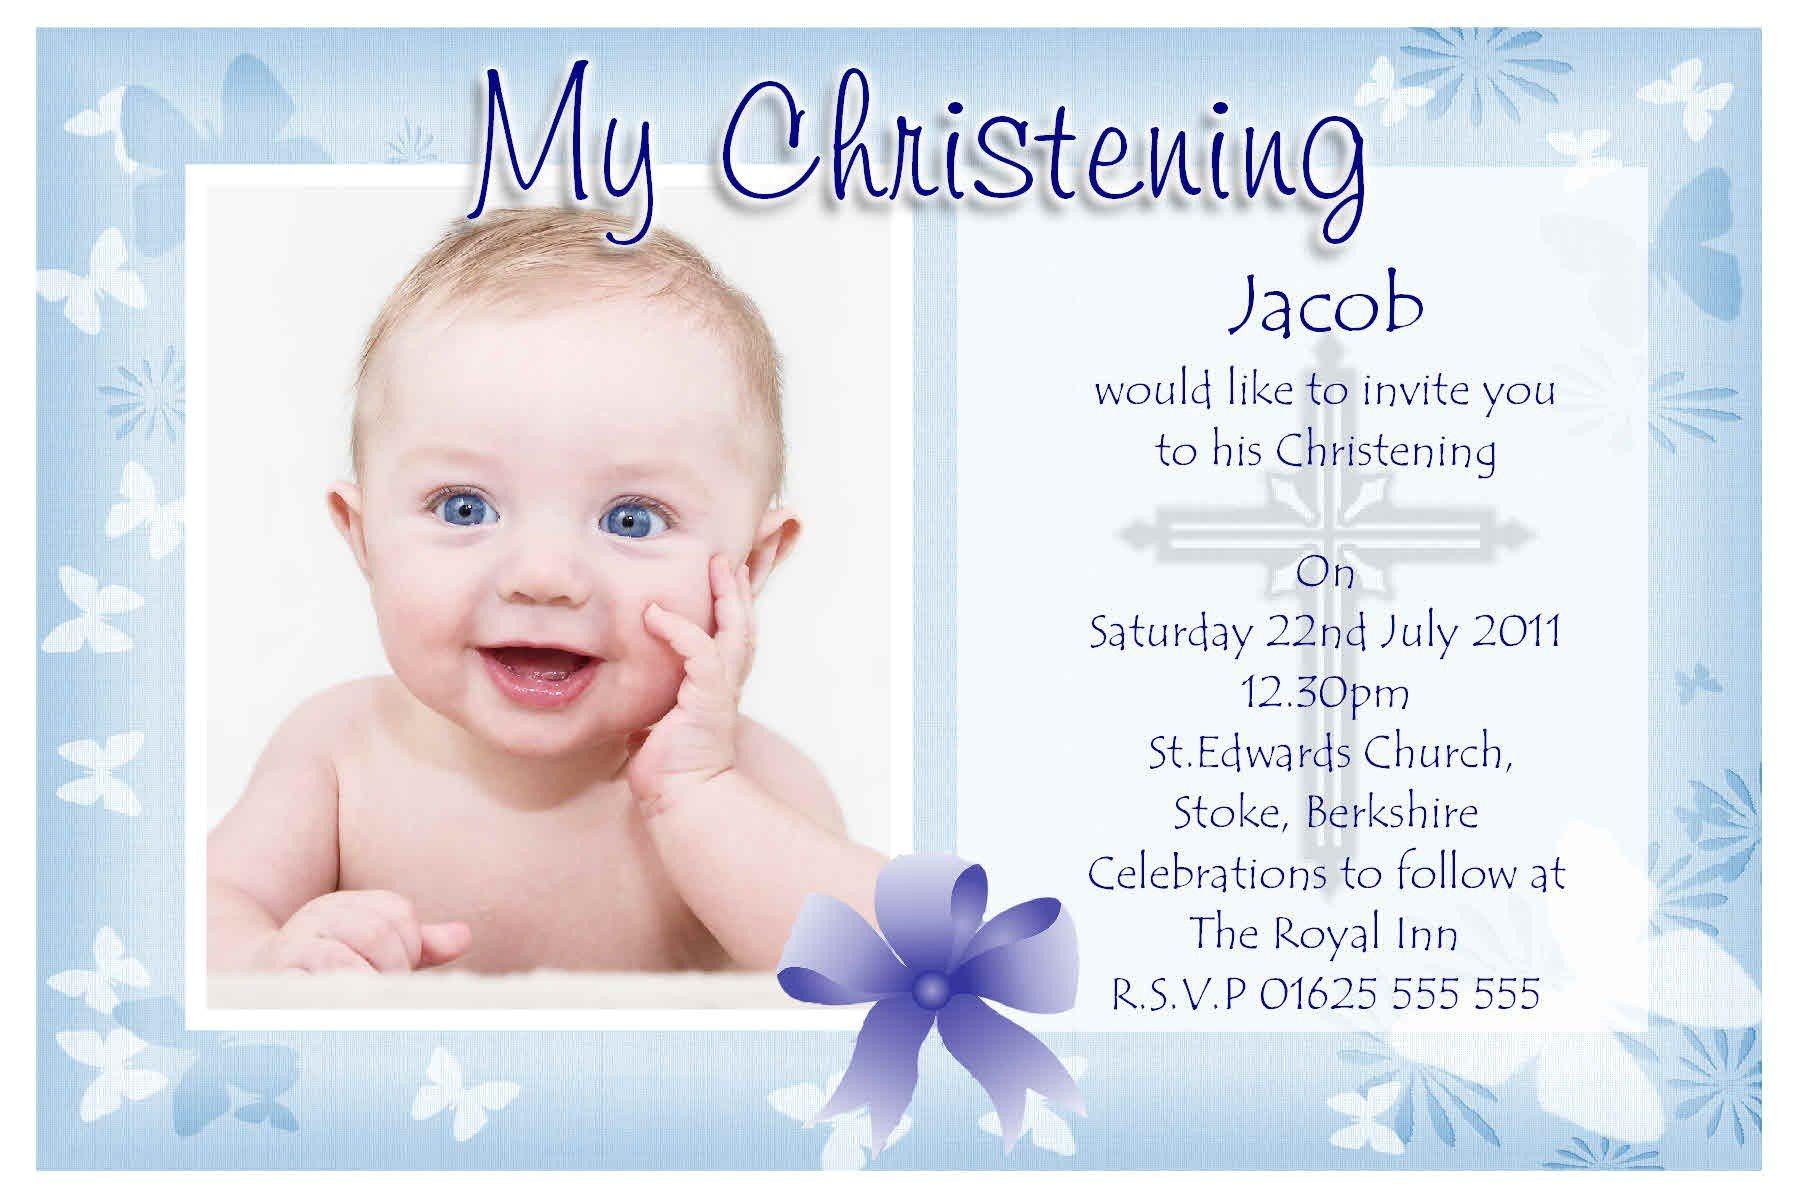 Sample Baptismal Invitation Card Baptism Invitation Baptism Invitations for Boys New